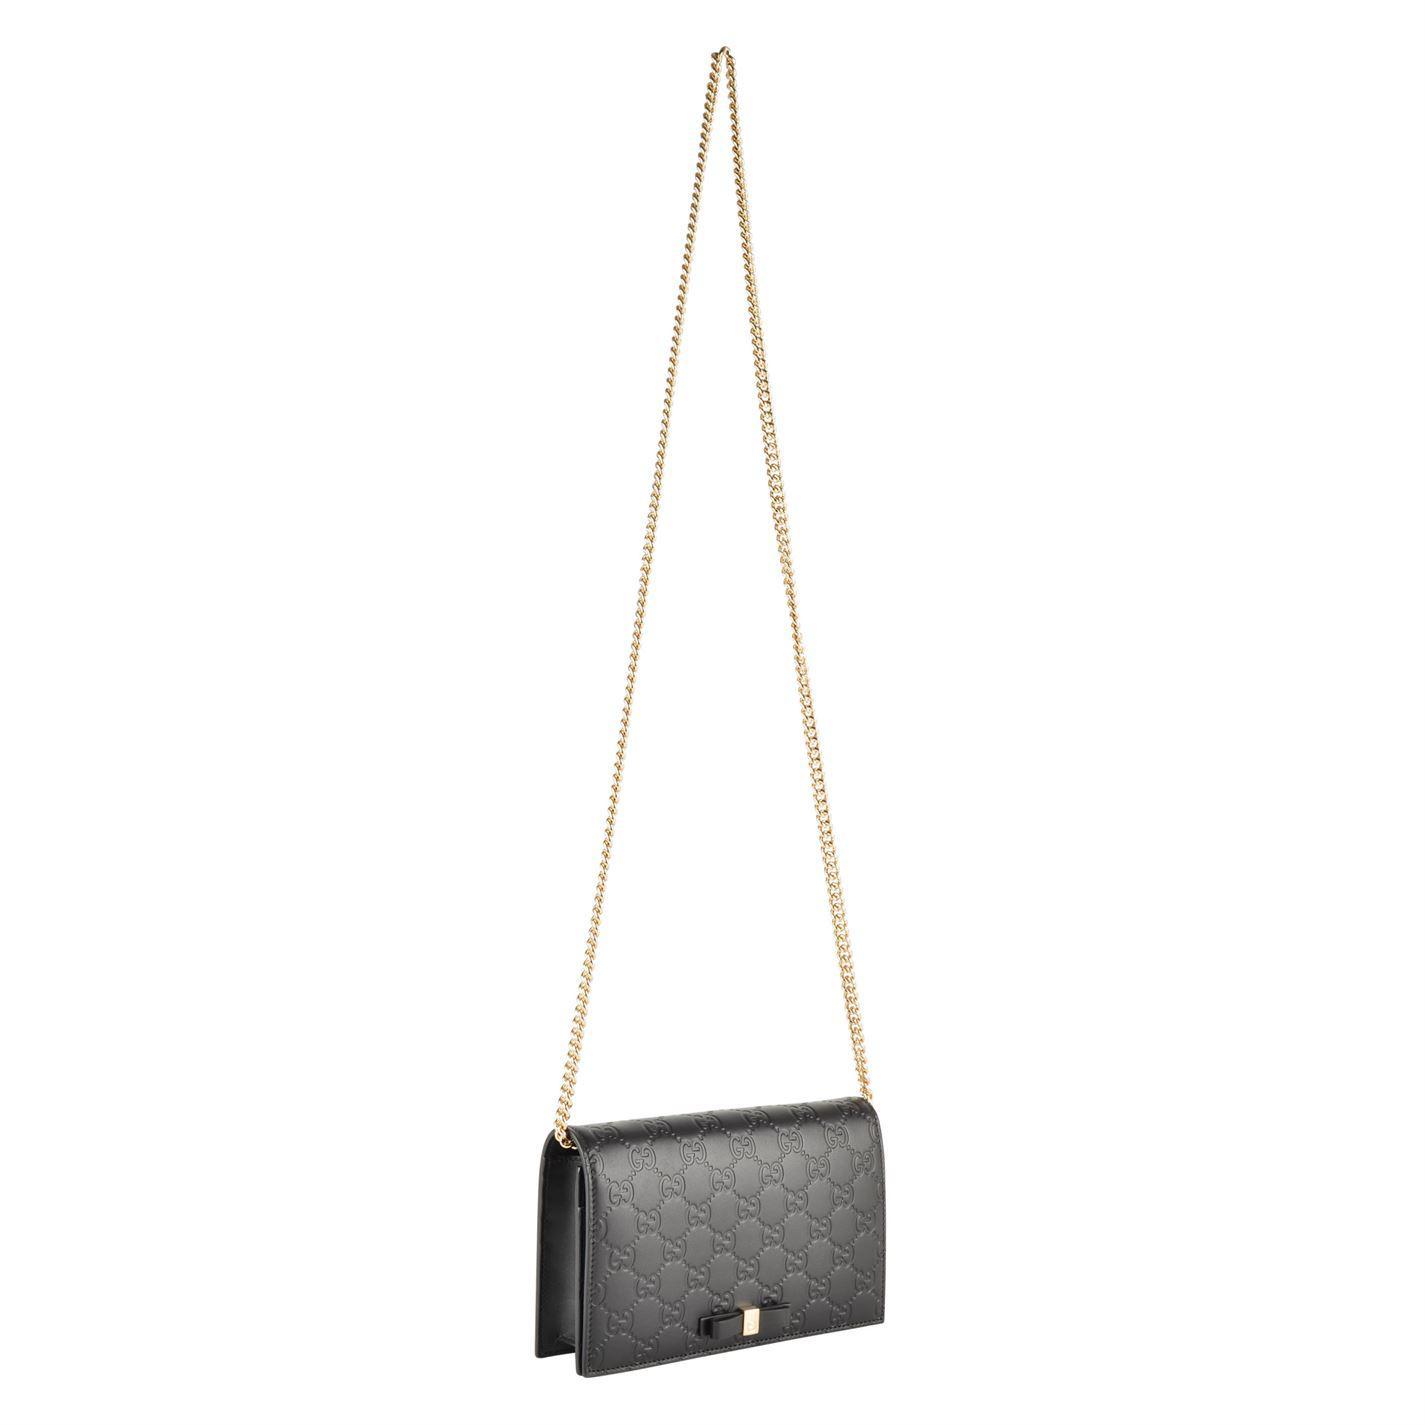 112679ef553 Gucci - Black Gg Bow Shoulder Bag - Lyst. View fullscreen